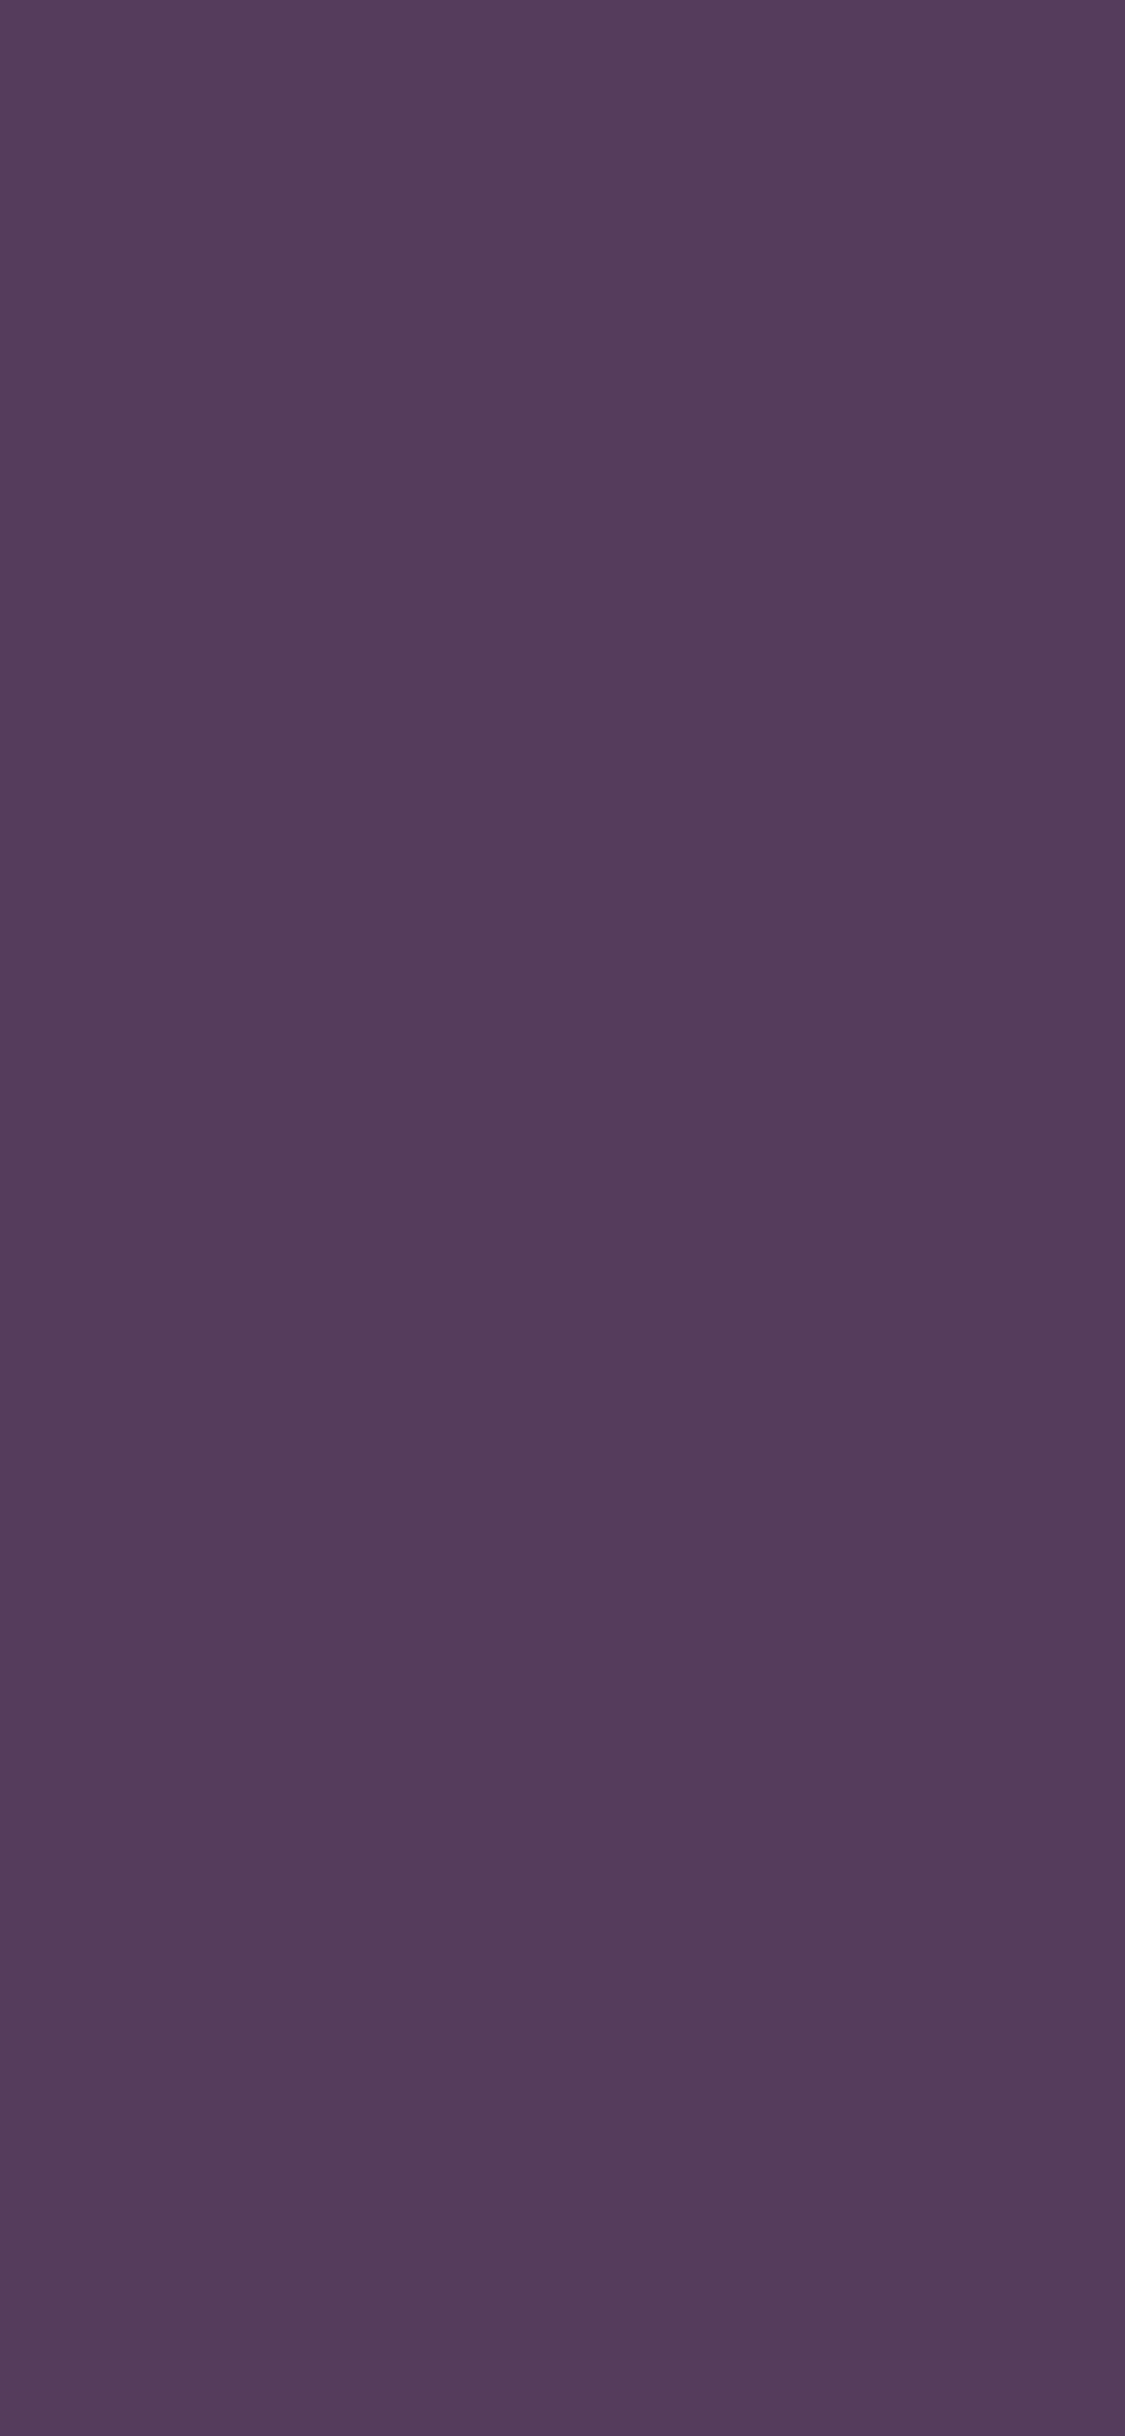 1125x2436 English Violet Solid Color Background